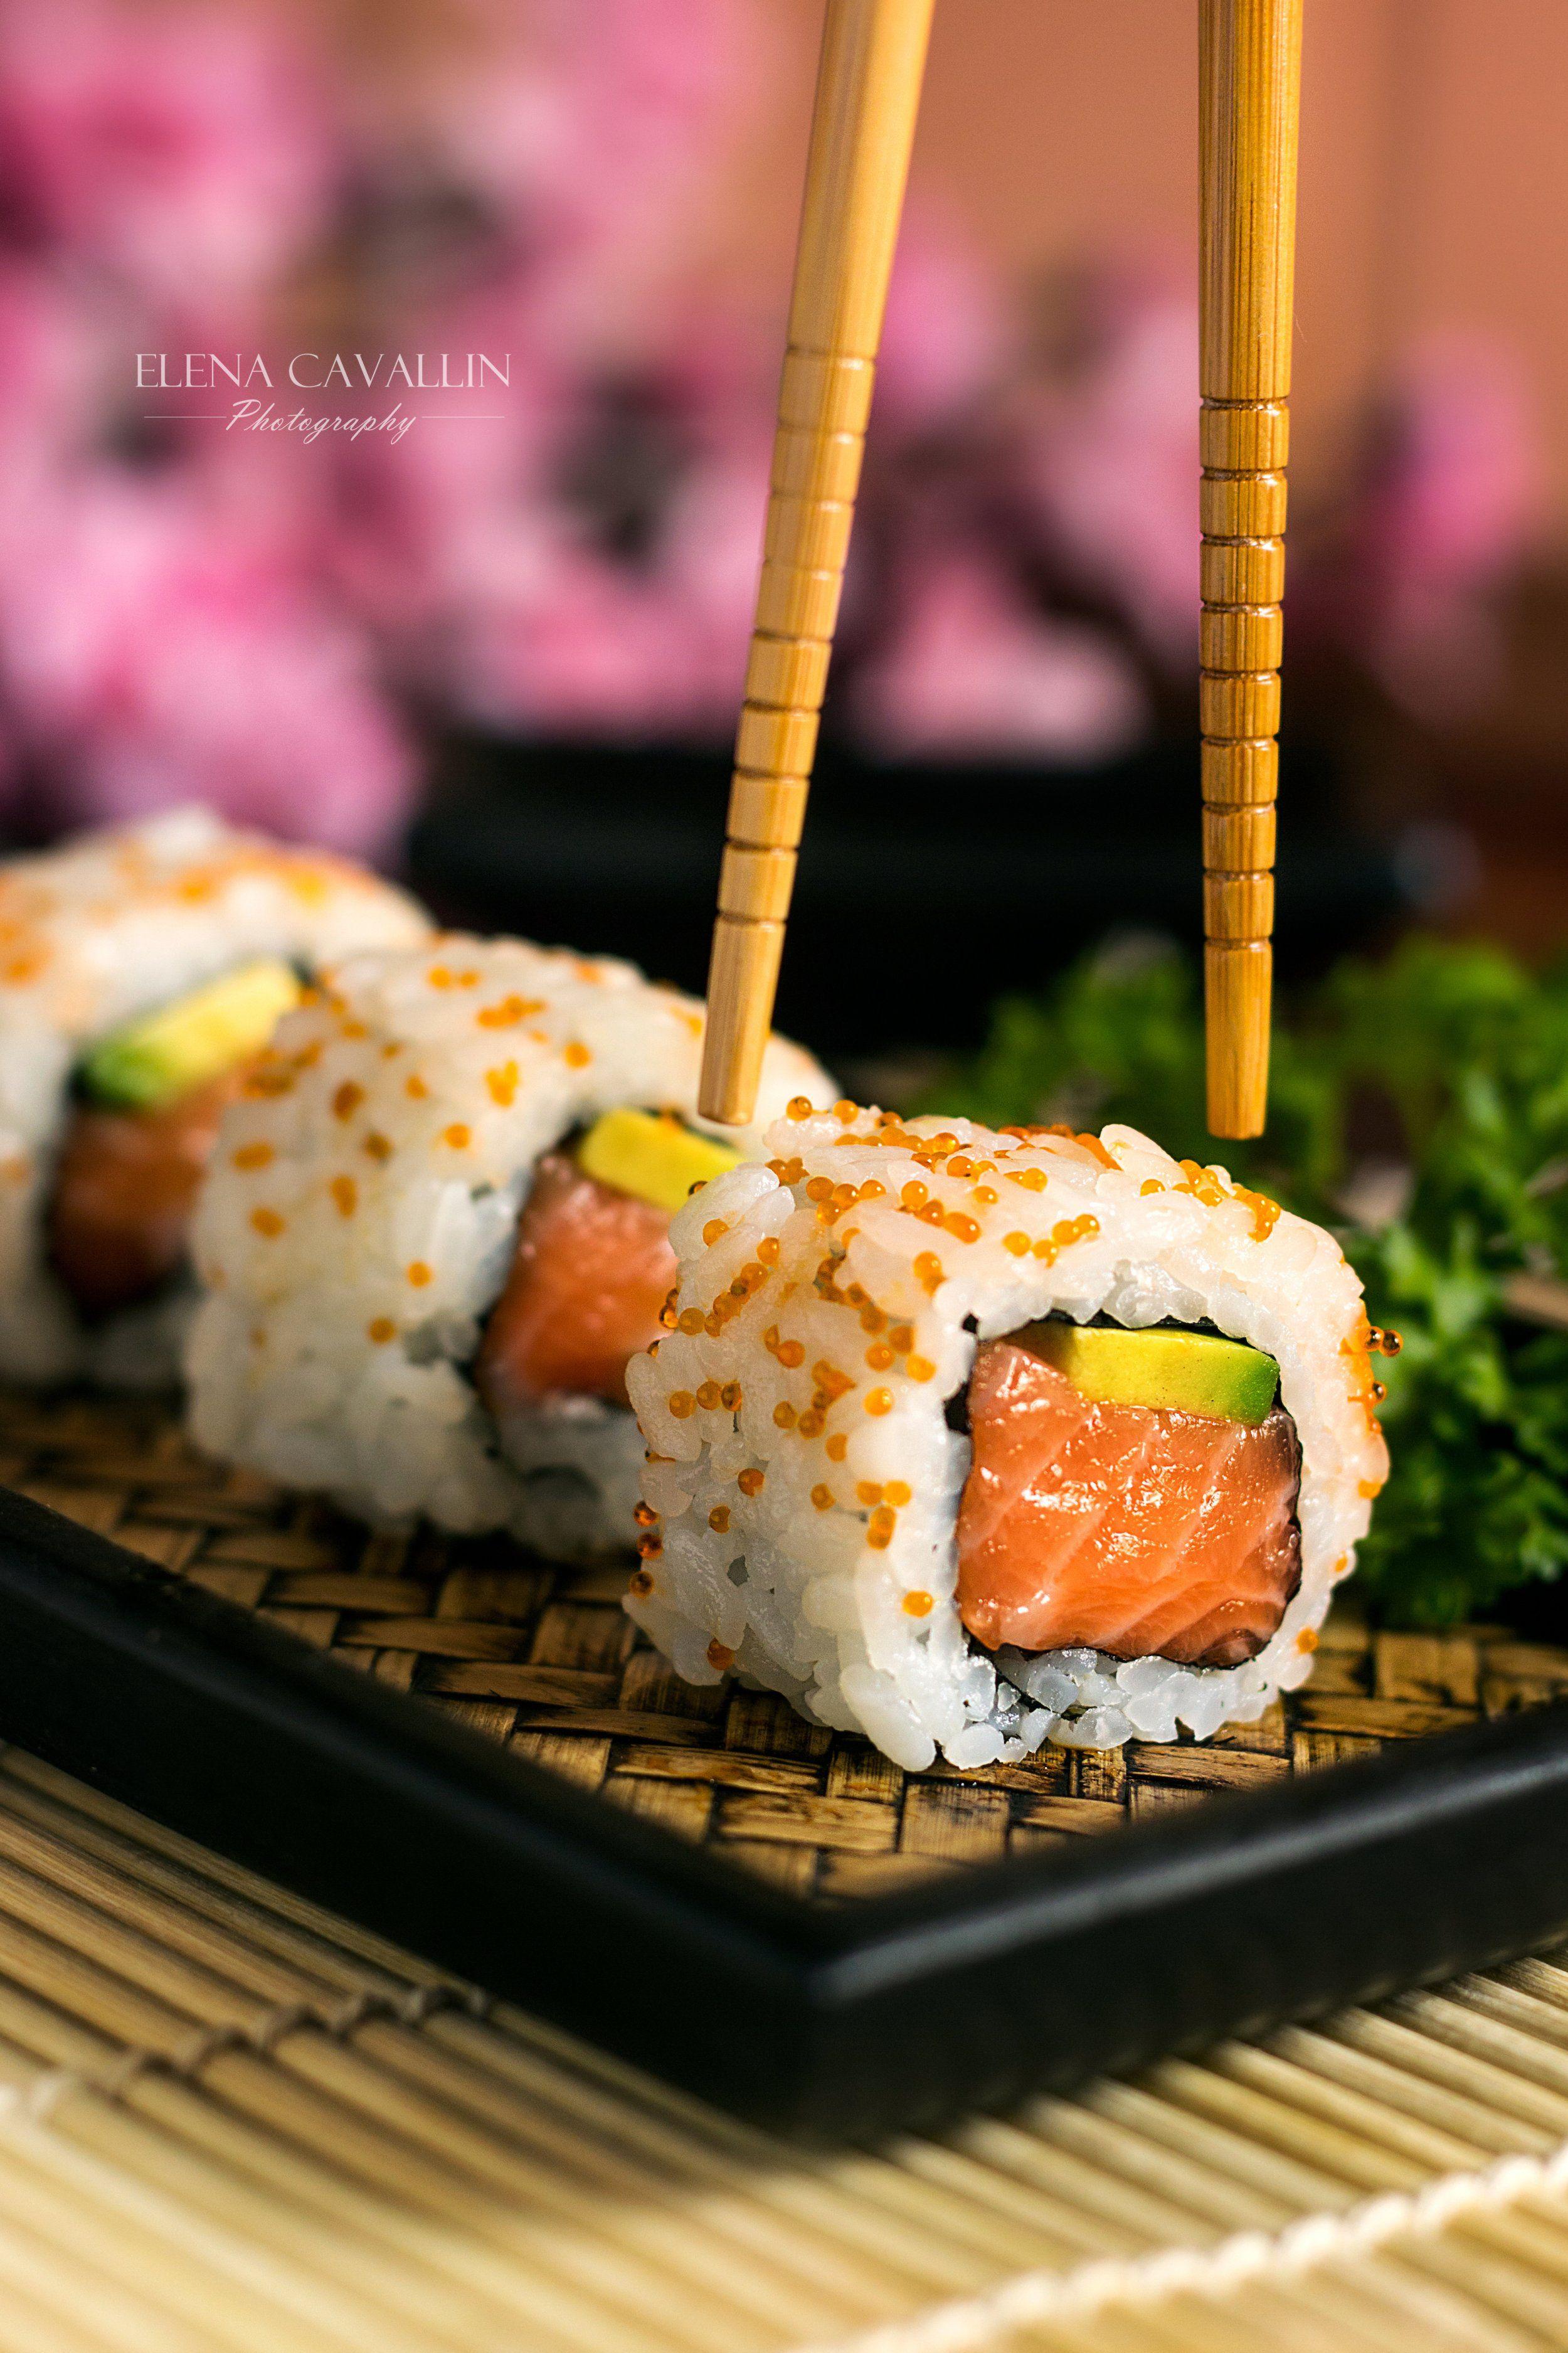 Sushi Rolls Uramaki Food Photography Sushi Dishes Sushi Recipes Asian Food Photography